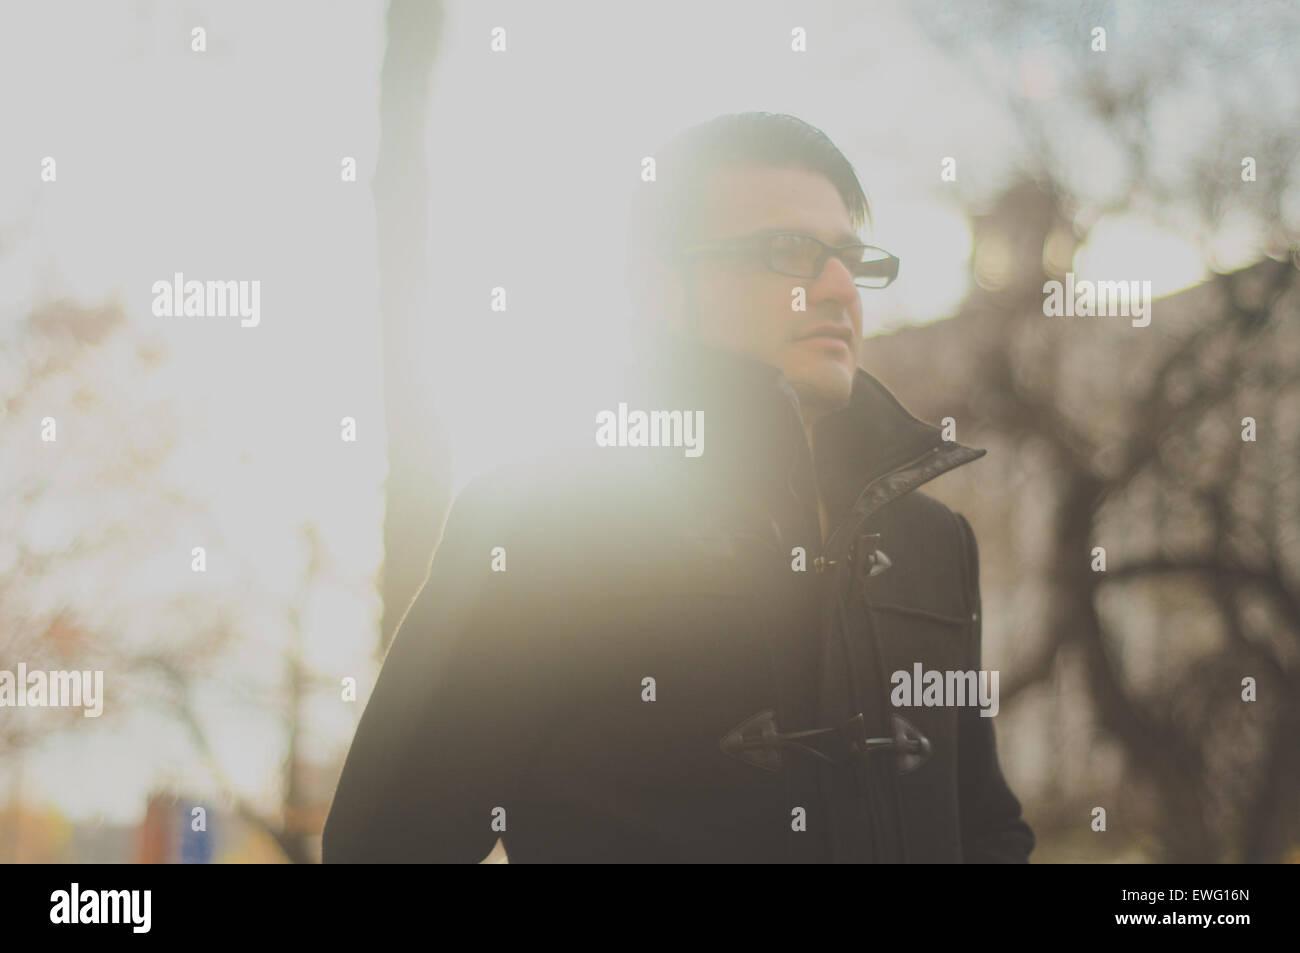 Male in Glasses Wearing Black Jacket Stock Photo